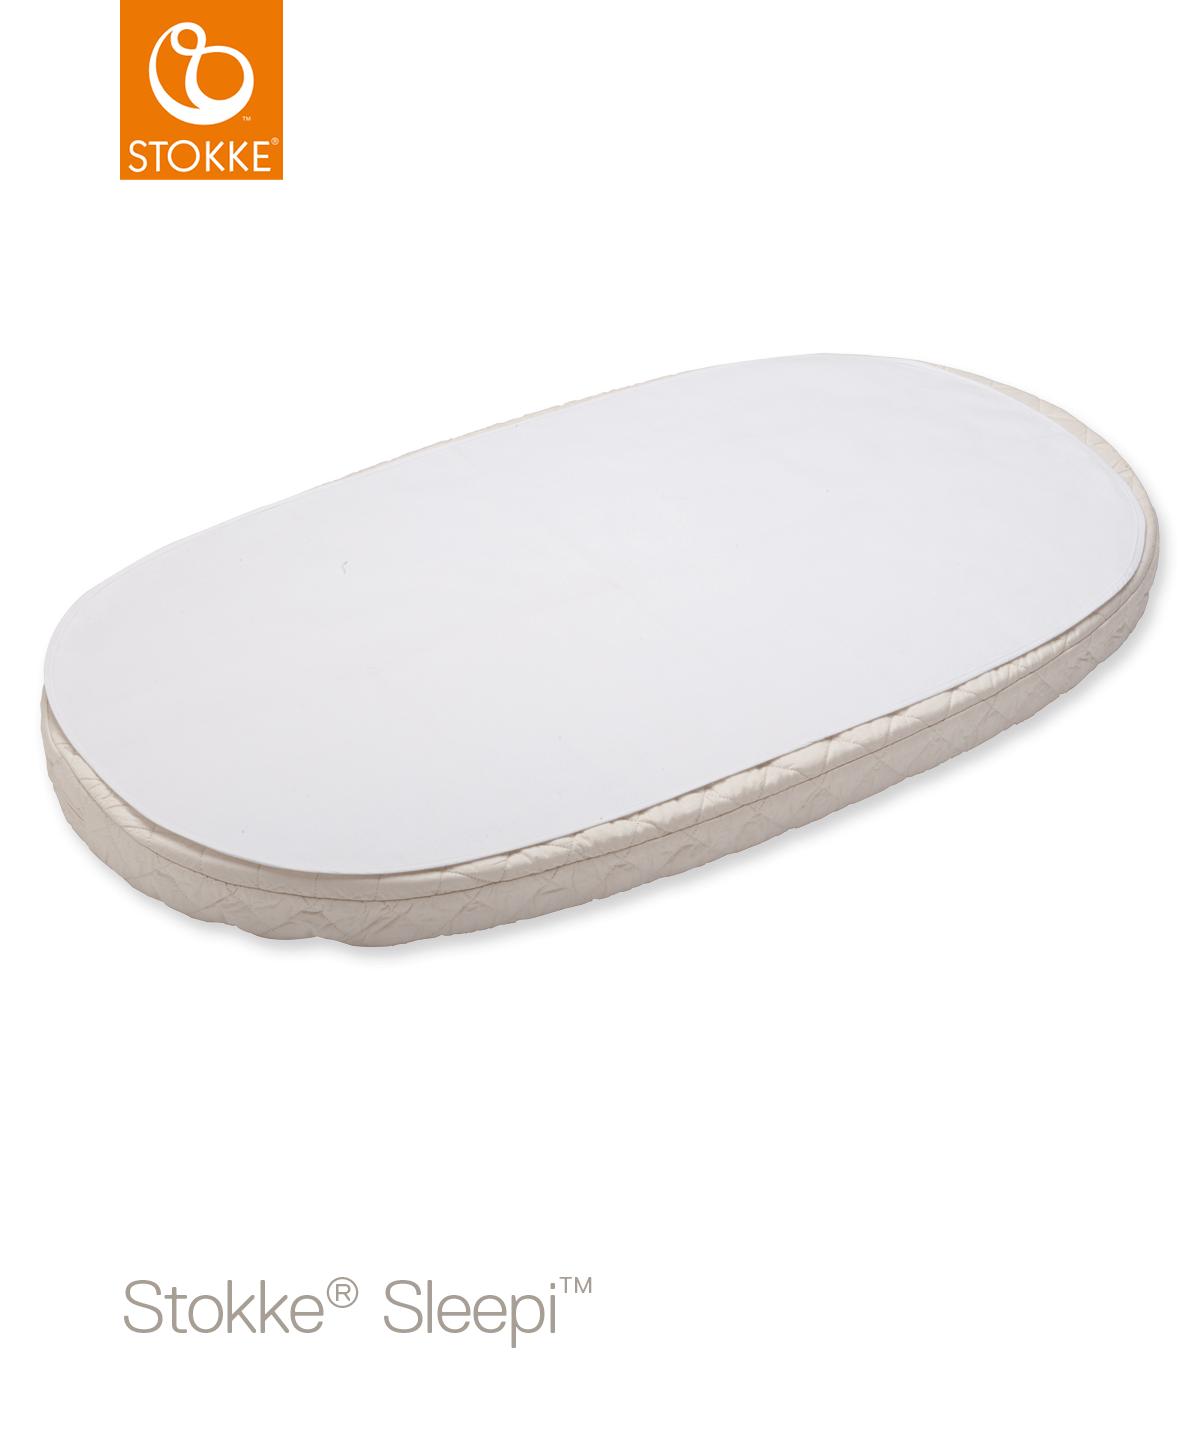 Простыня Stokke® Sleepi™